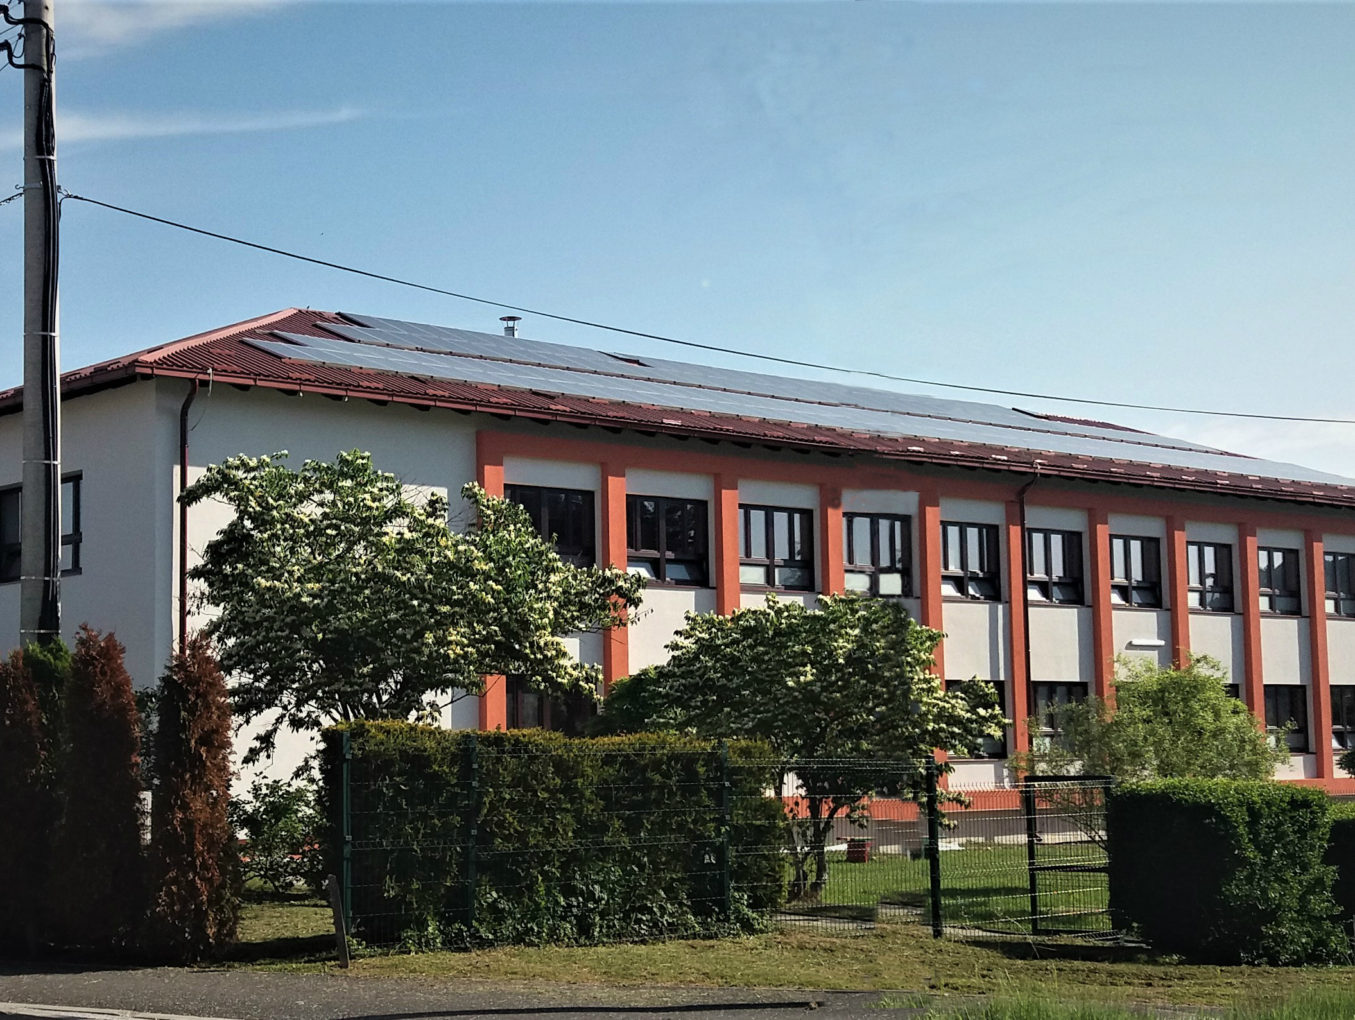 Završena energetska obnova zgrade Osnovne škole Franje Serta Bednja